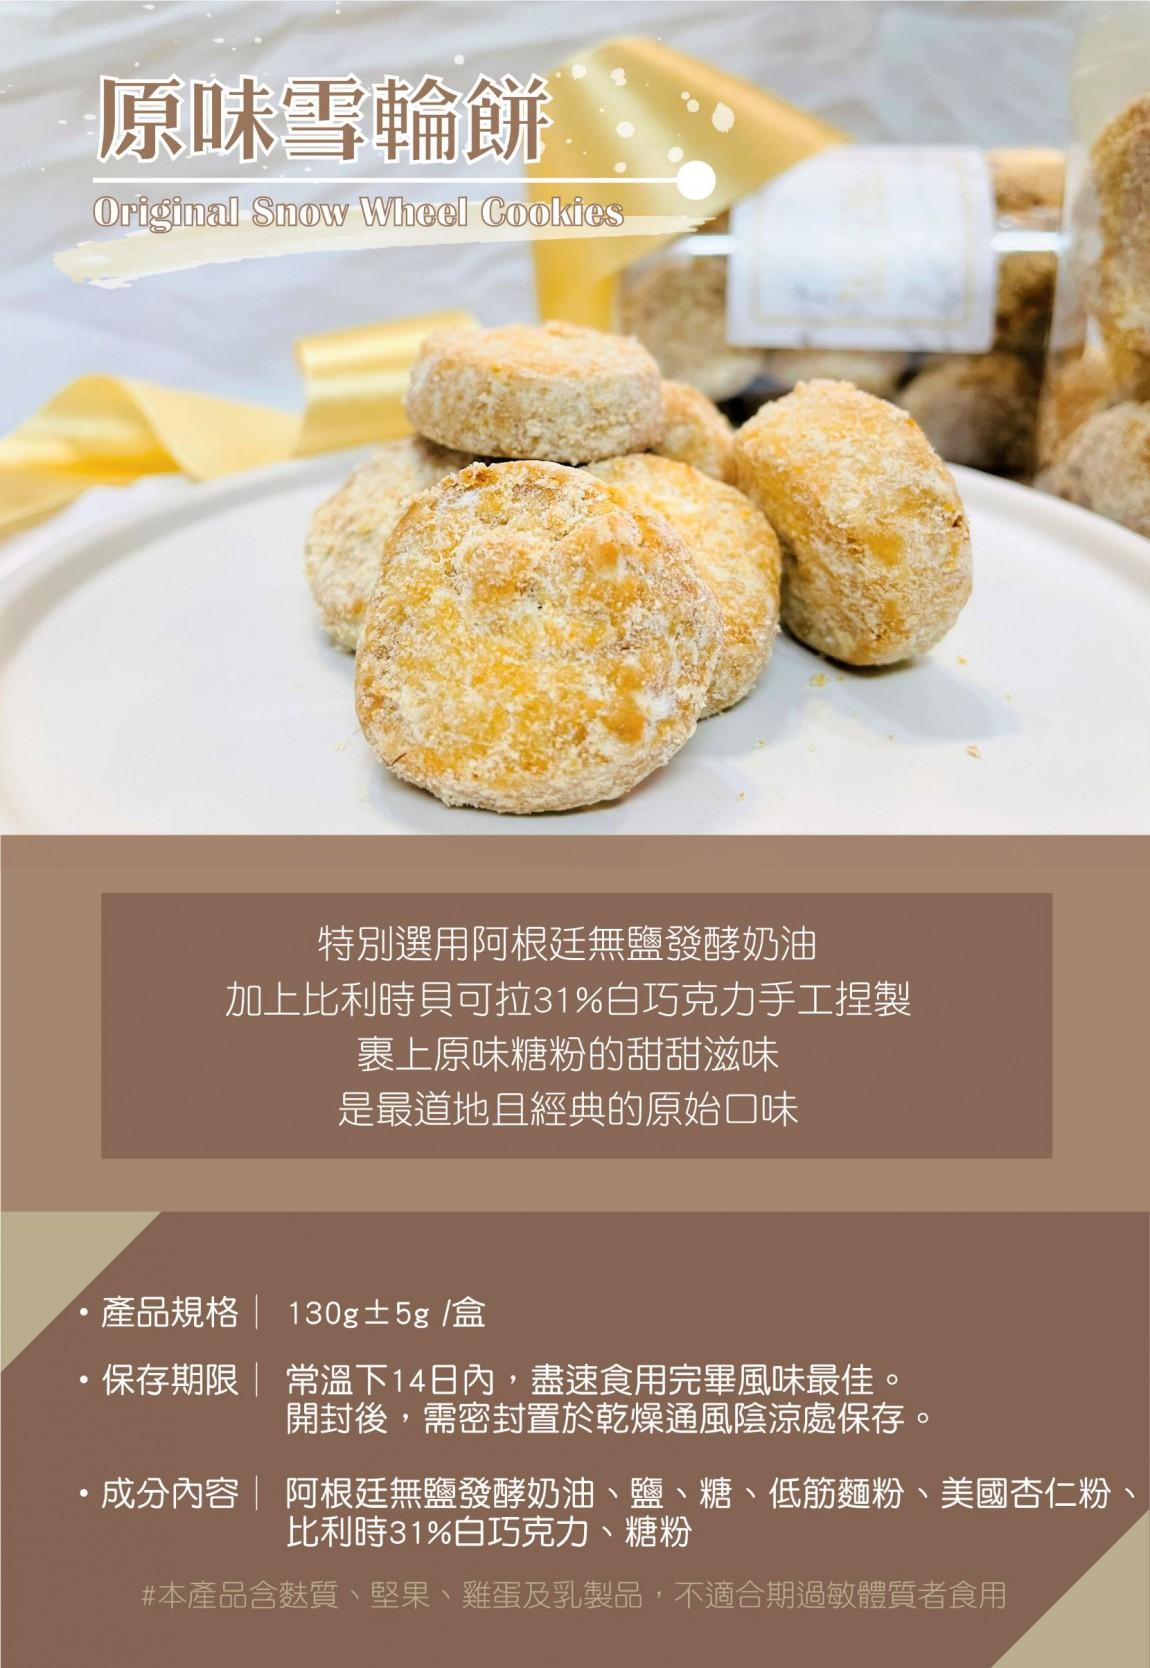 ez長條_原味雪輪餅